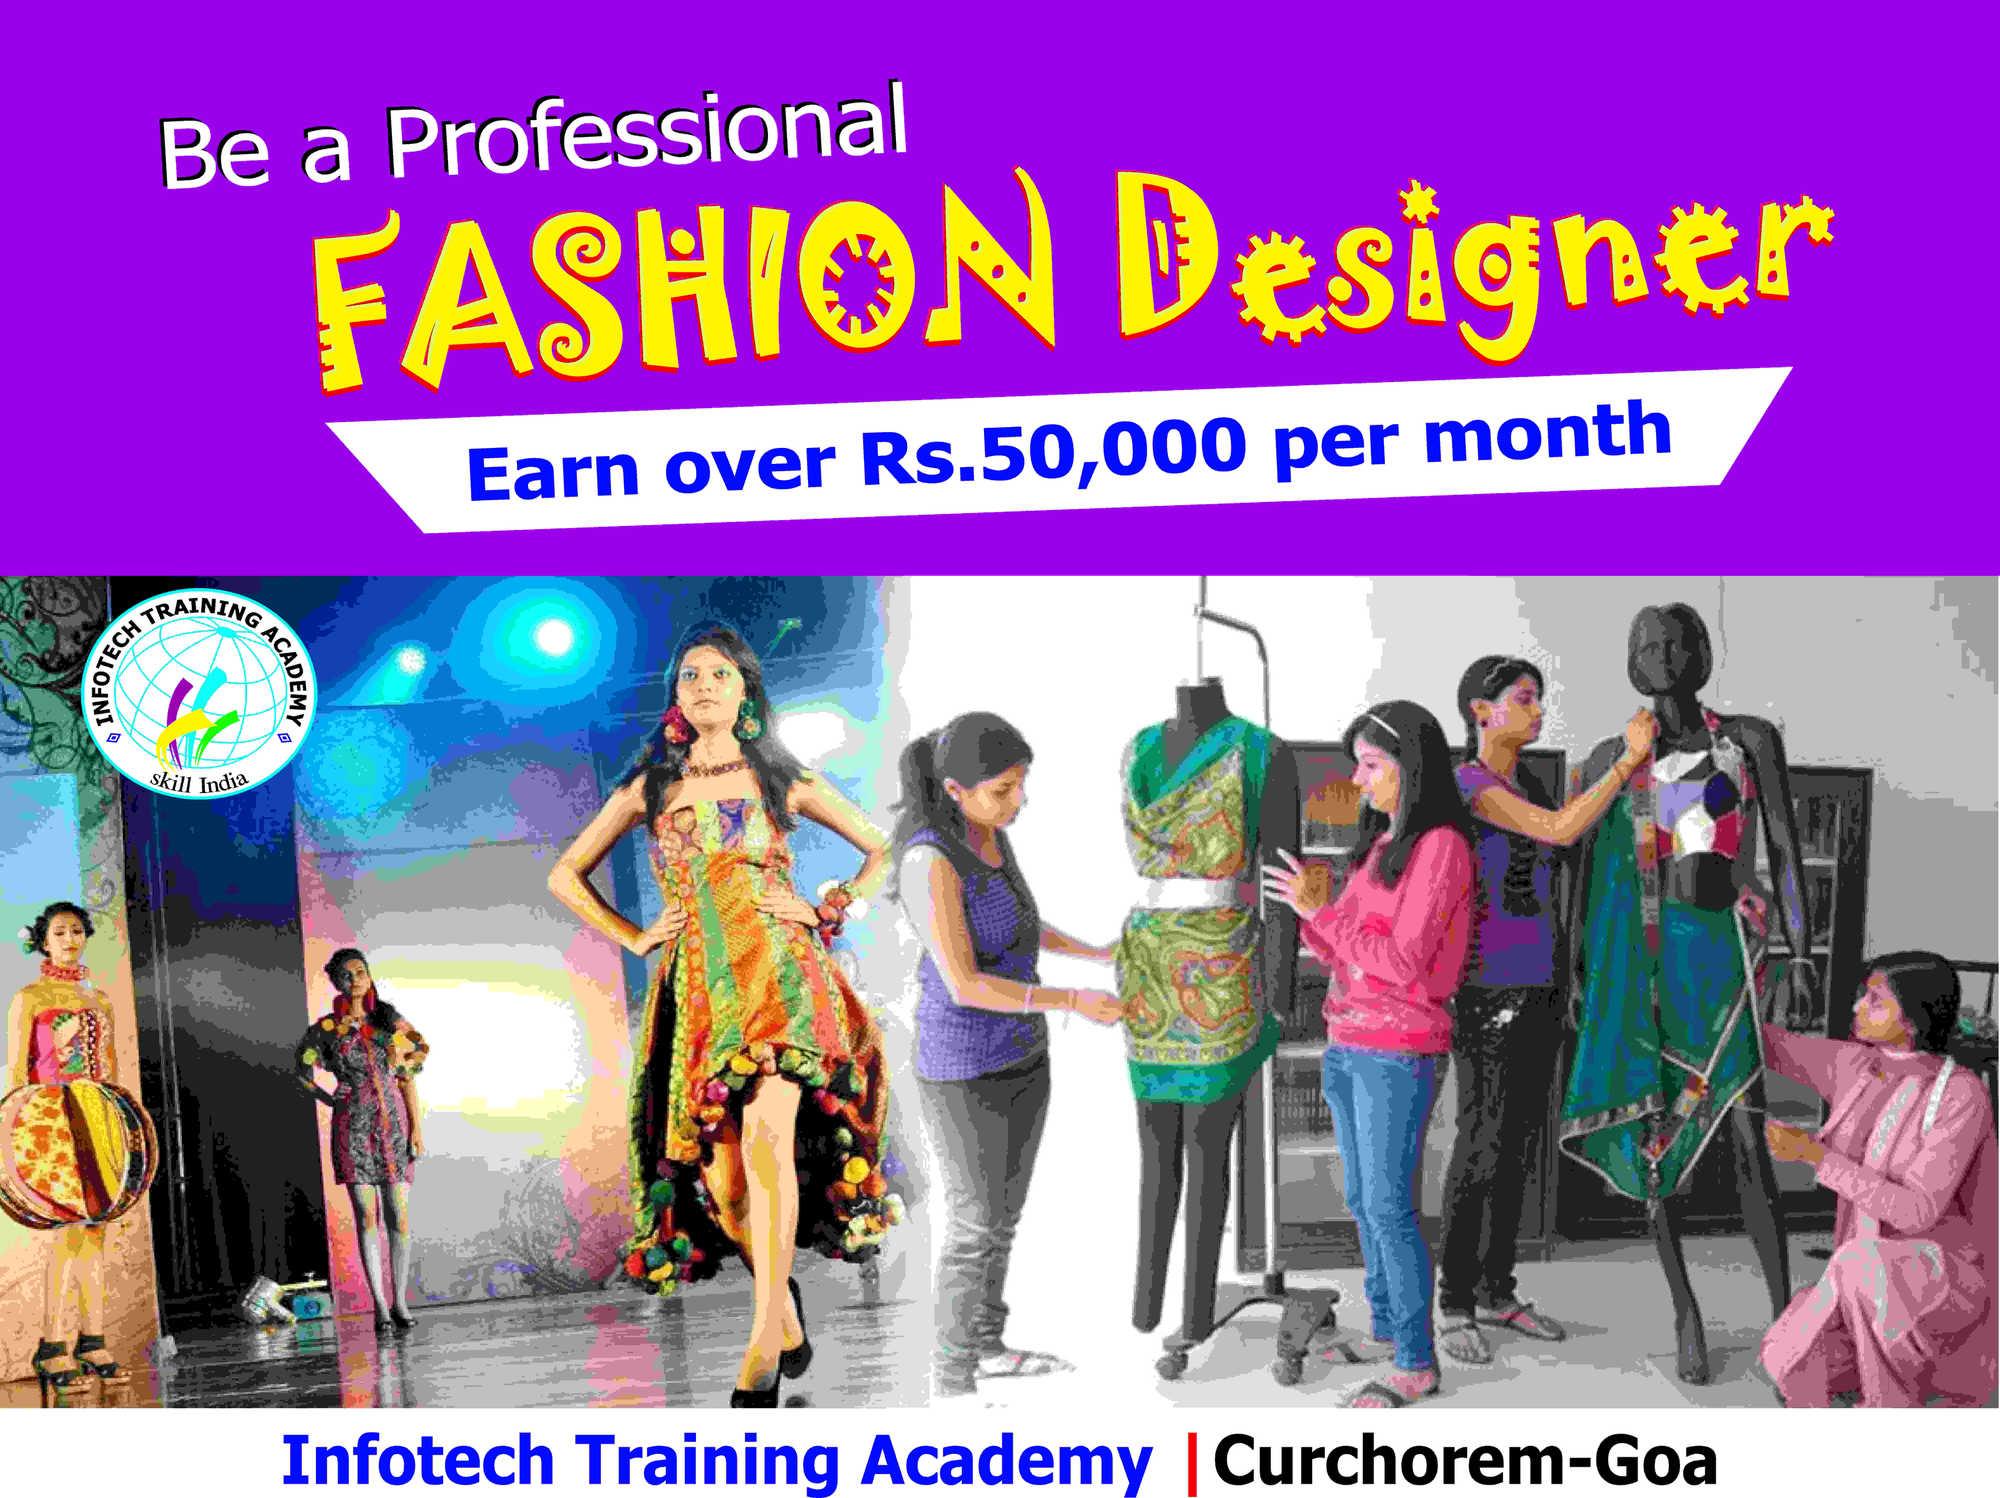 Infotech Training Academy Llp Curchorem Computer Training Institutes In Goa Justdial